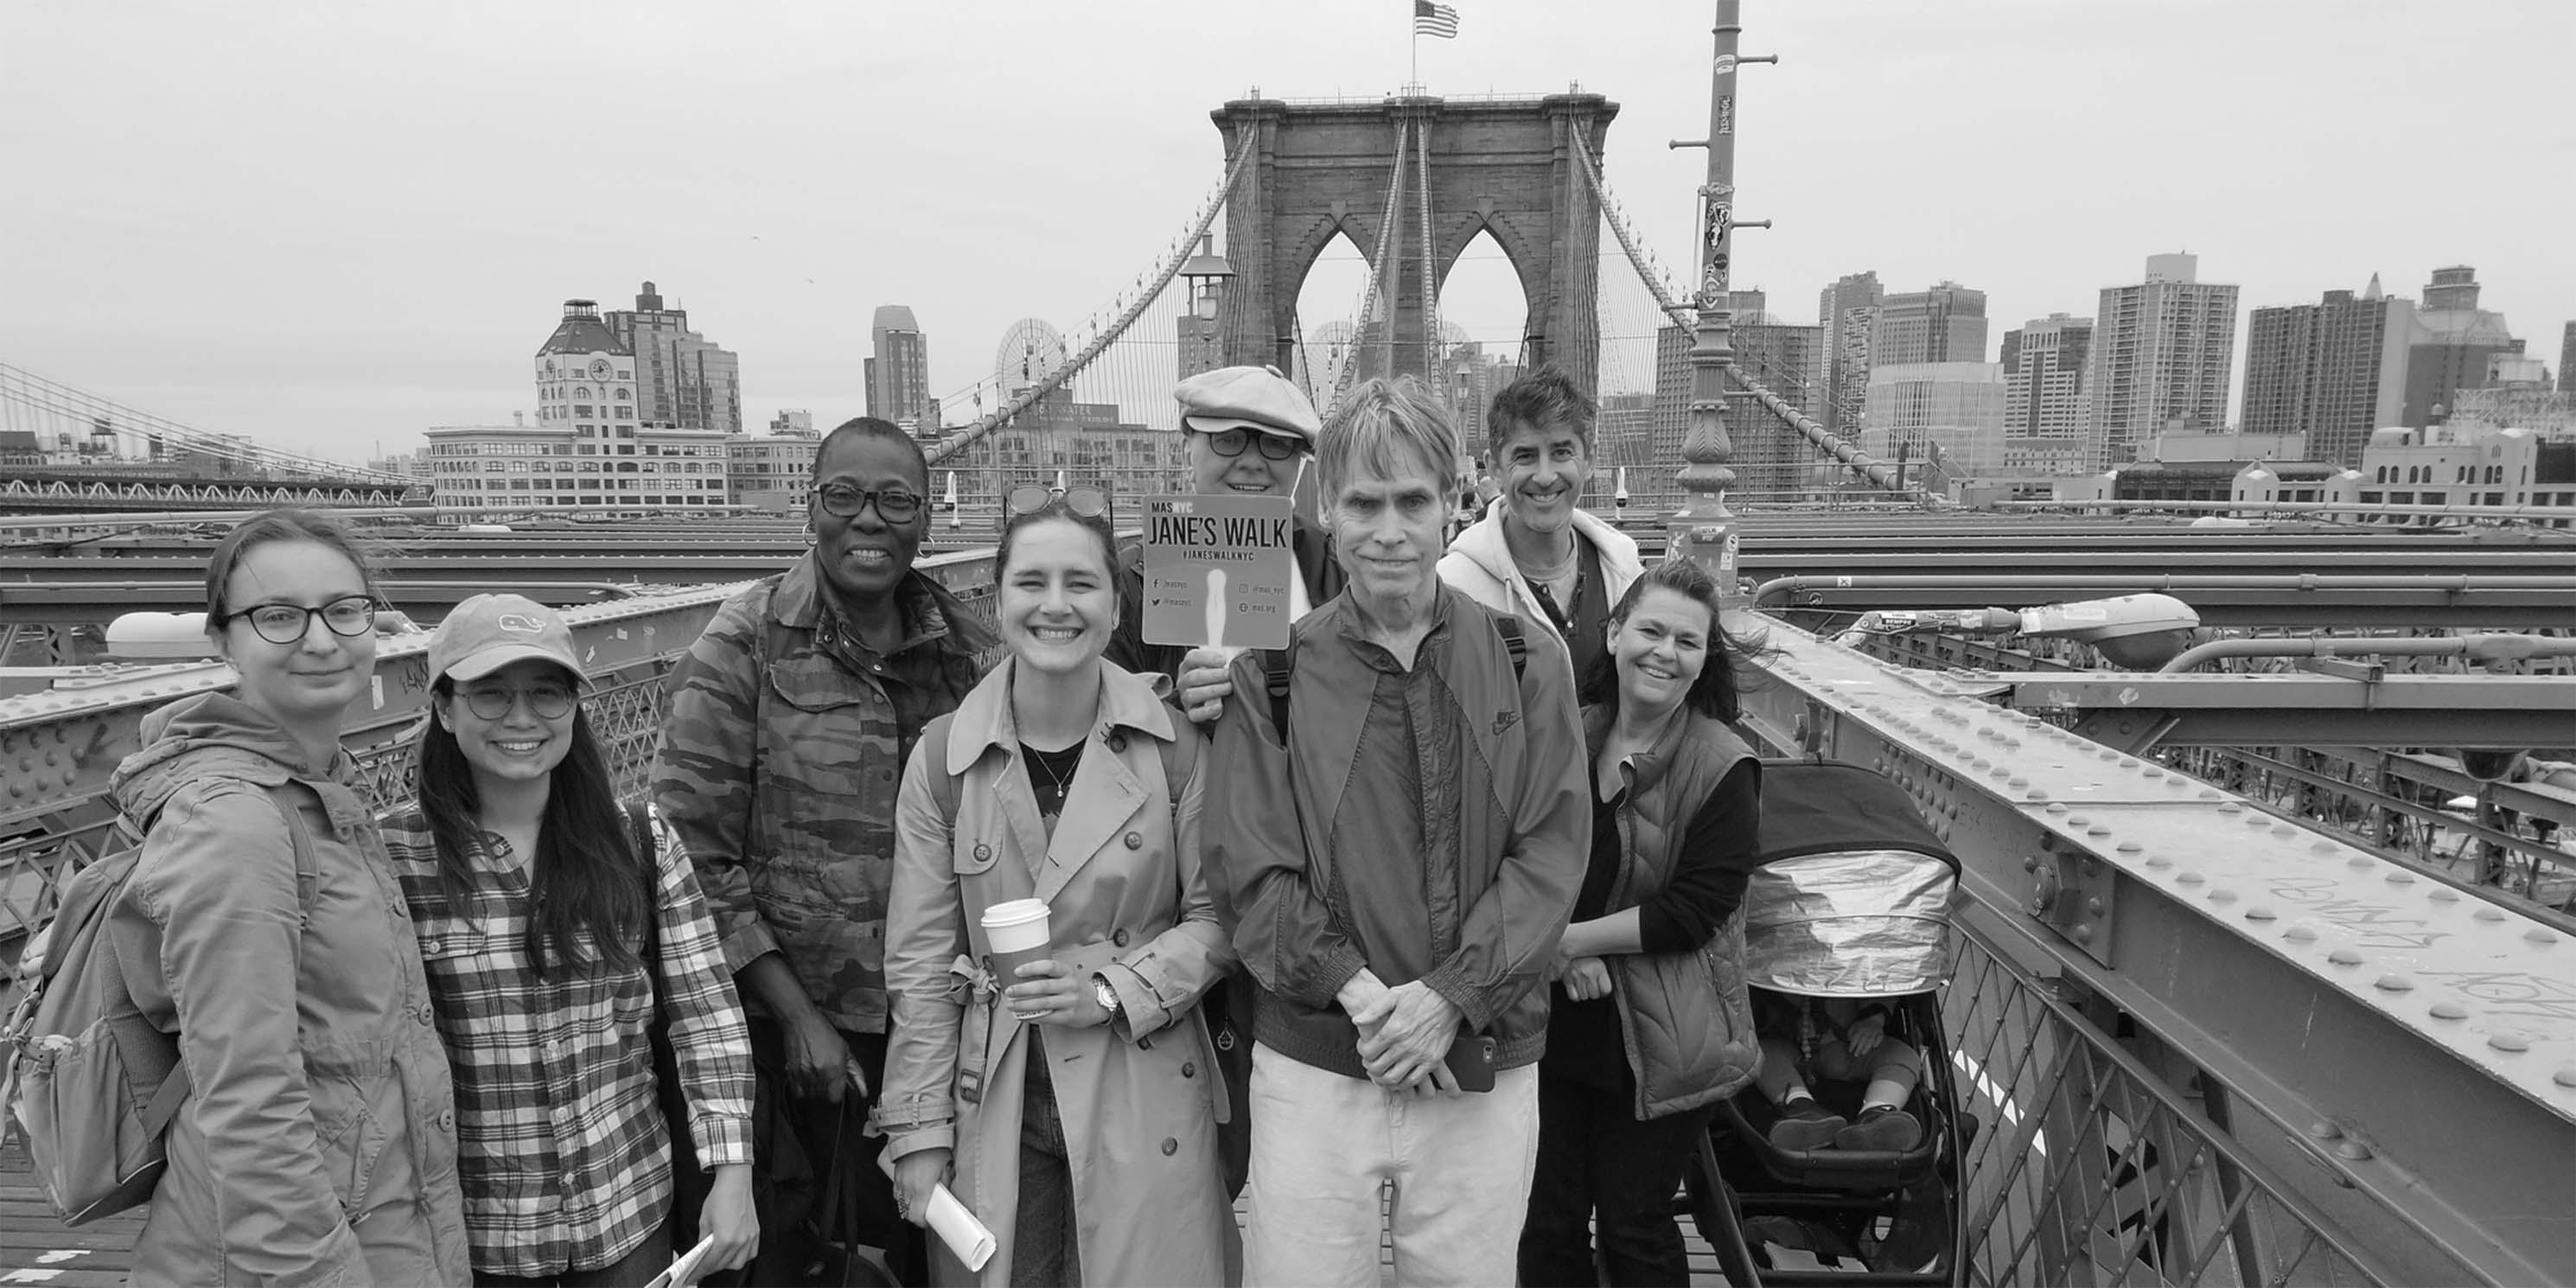 Jane's Walk participants on the Brooklyn Bridge